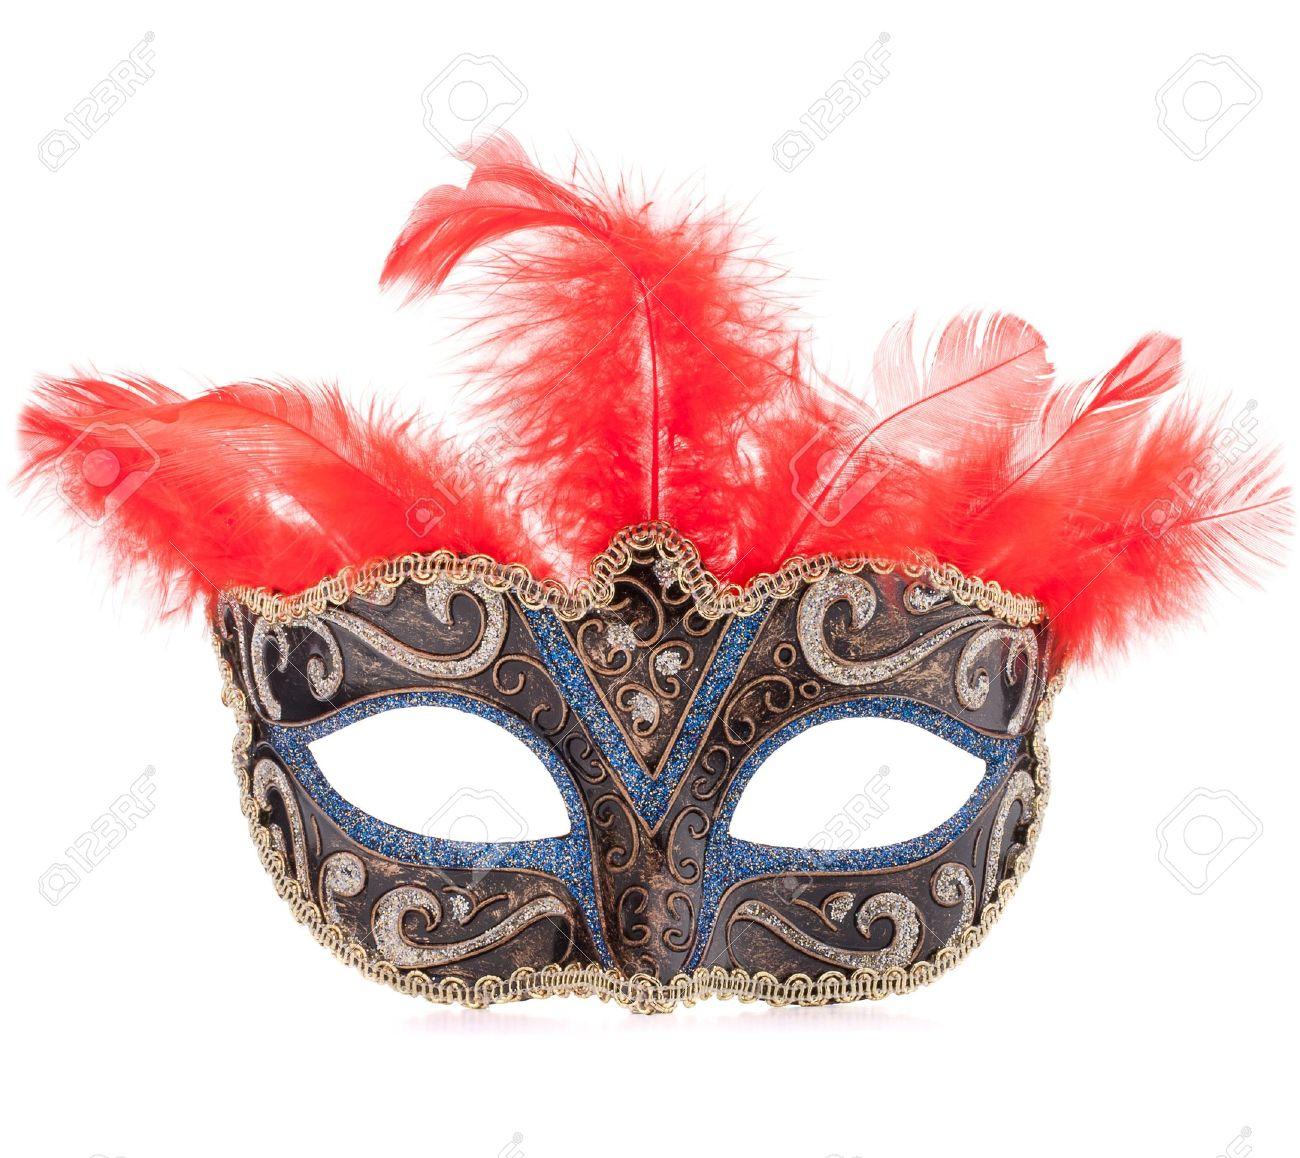 Venetian carnival mask isolated on white background cutout Stock Photo - 18221796